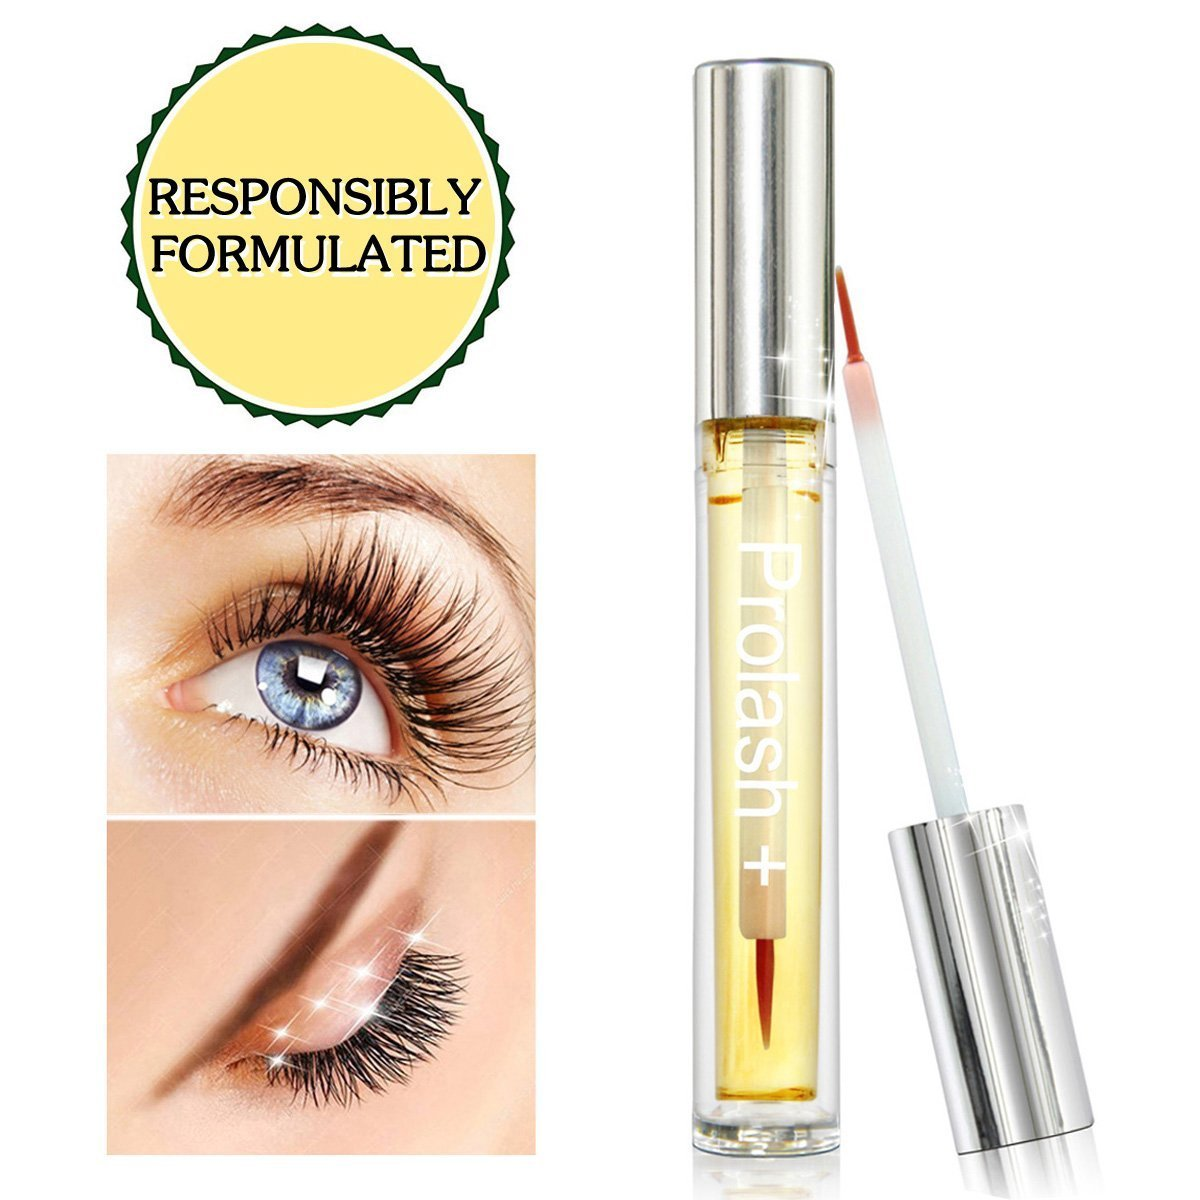 484cb266af4 Amazon.com: LashesBeauty Advanced Eyelash Growth Serum Eyelash Enhancer for  Longer, Fuller, Thicker Eyelash & Eyebrow: Beauty